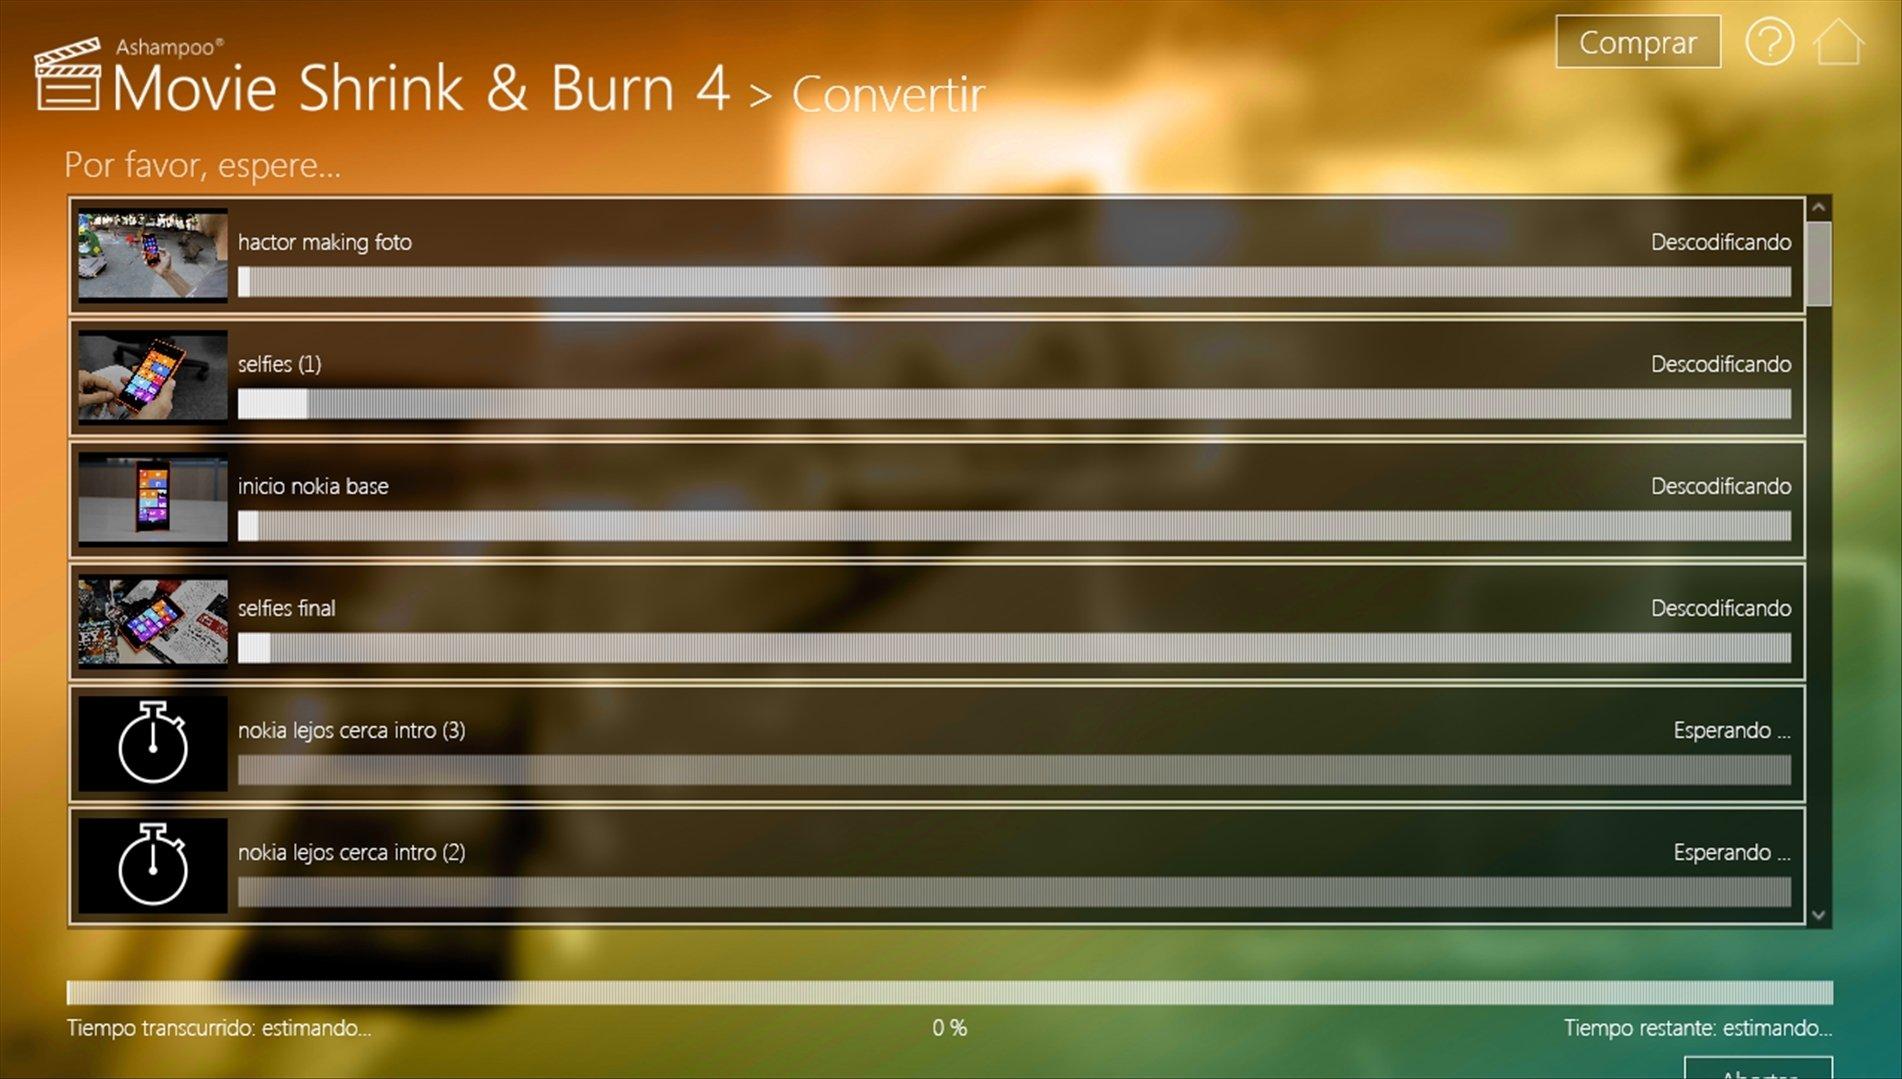 Download Ashampoo Movie Shrink amp Burn 402 for Windows